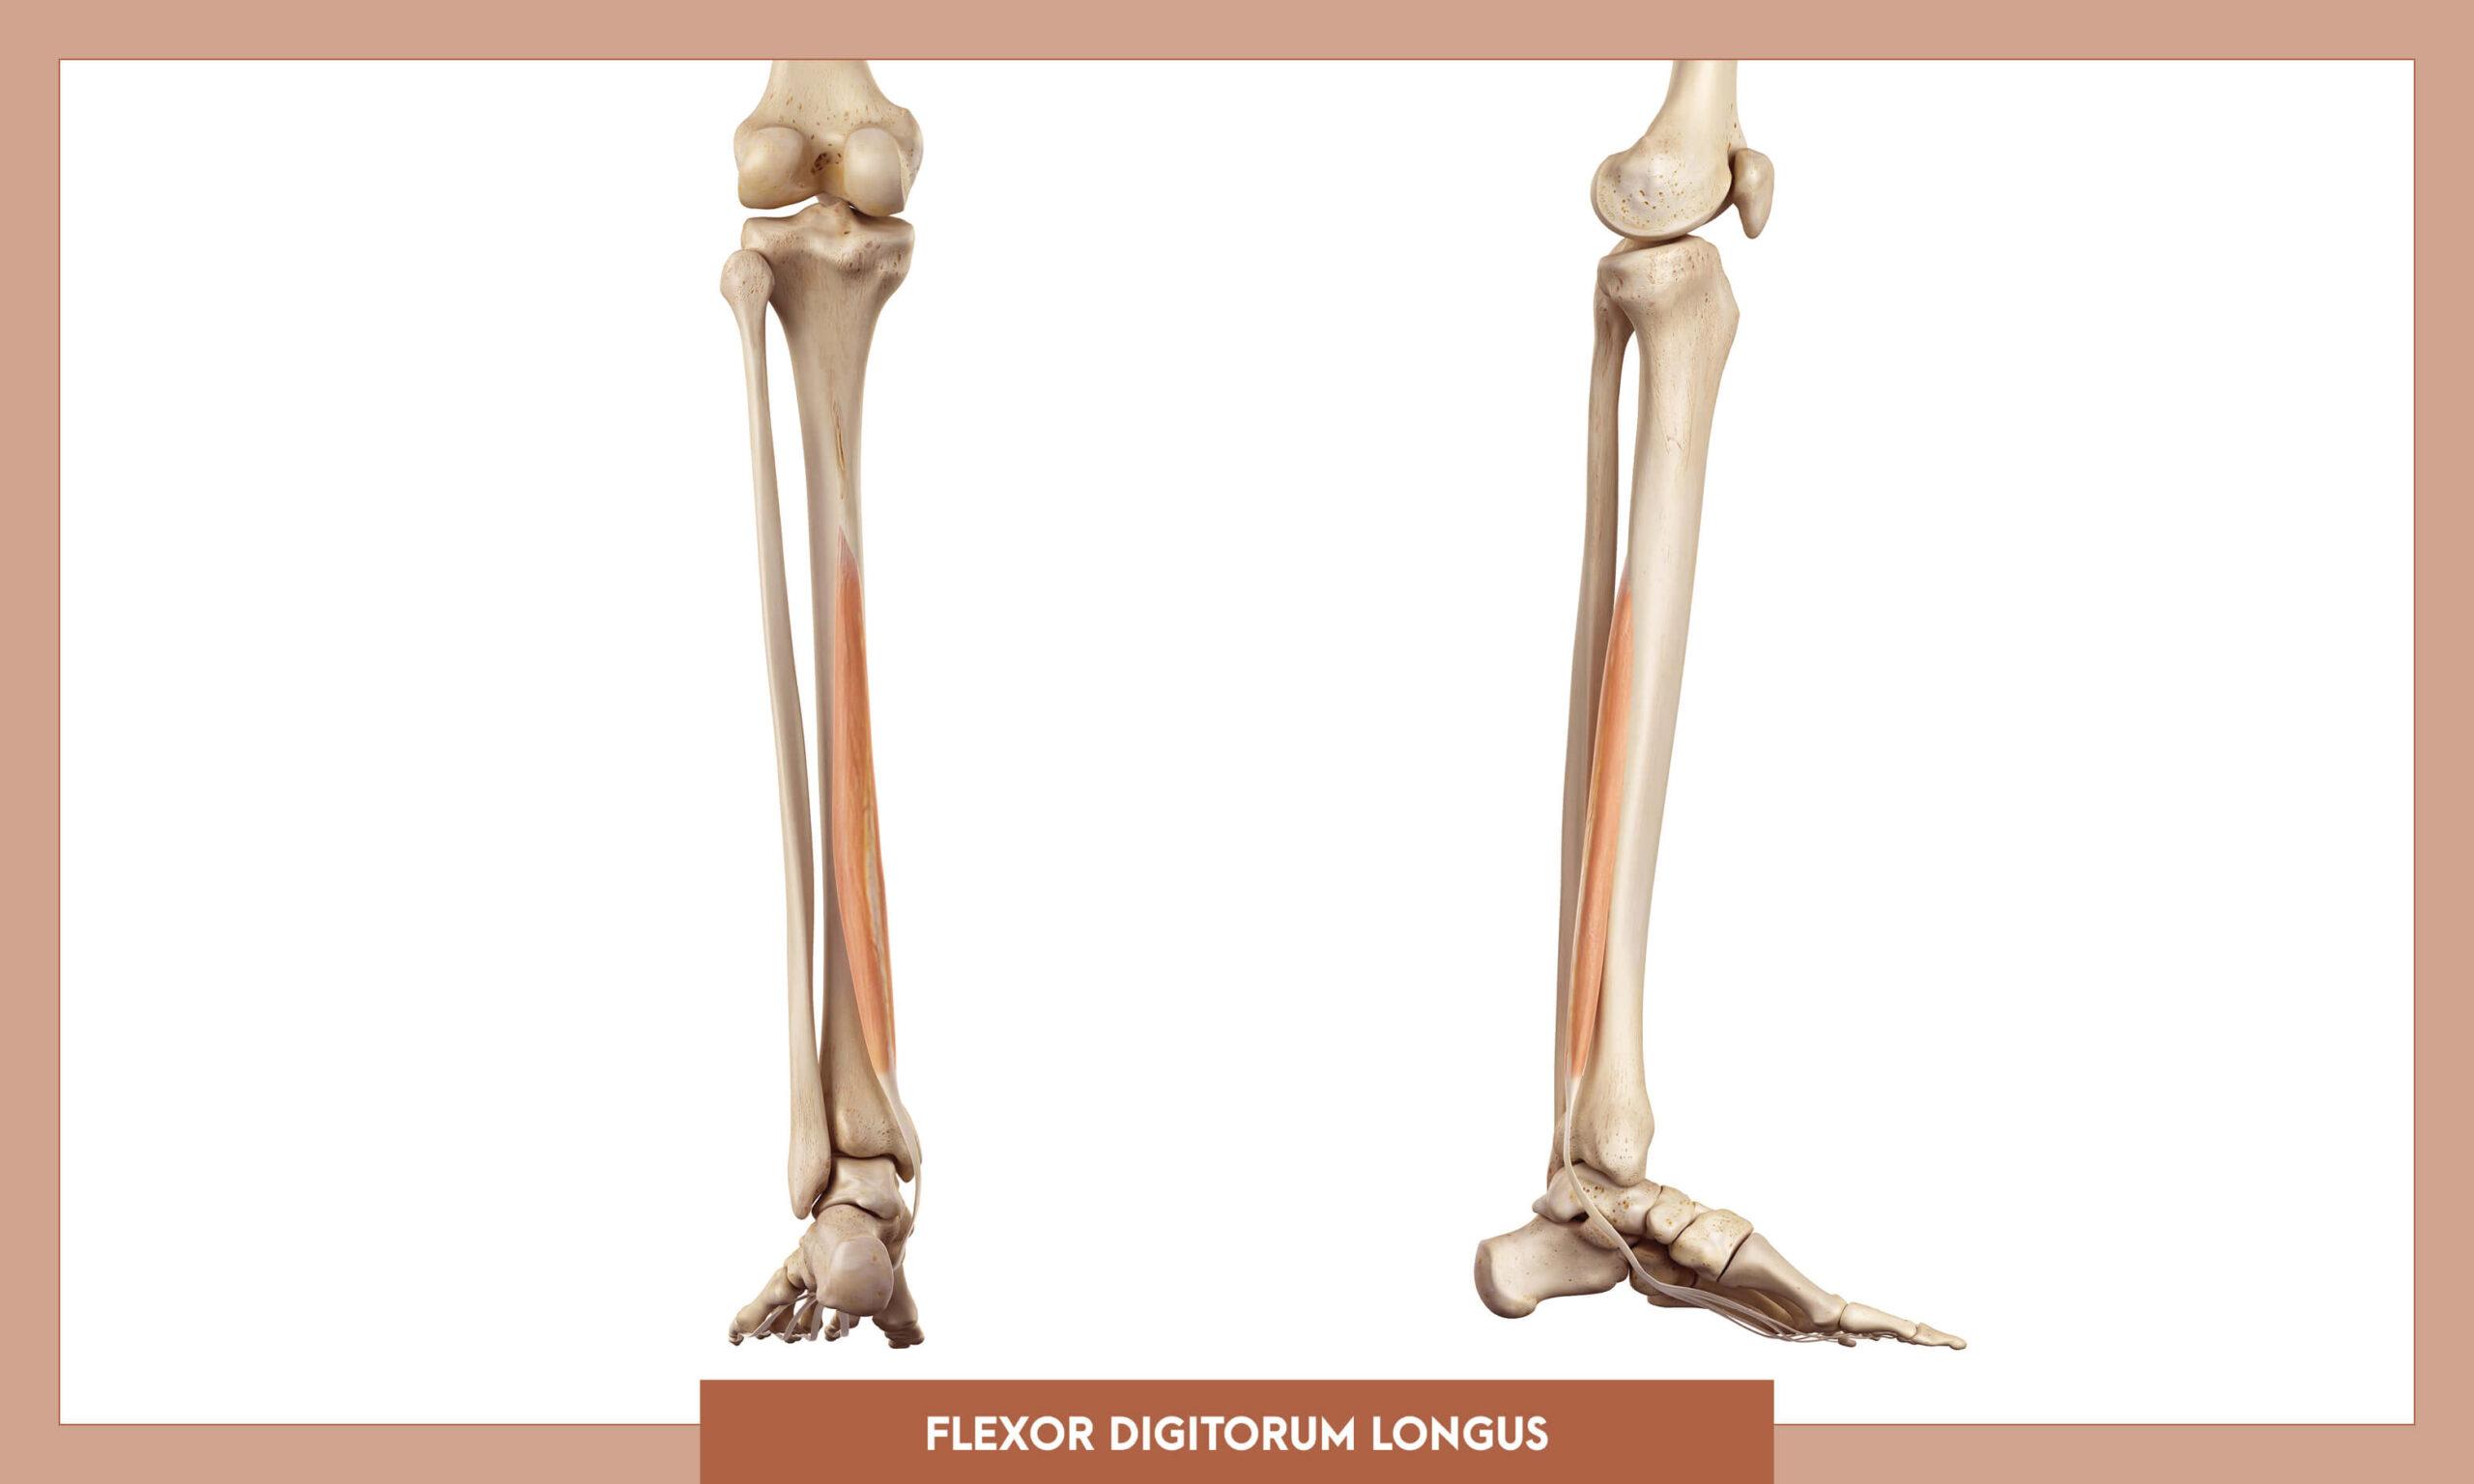 Muscles of thee Lower Limb - Flexor digitorum longus